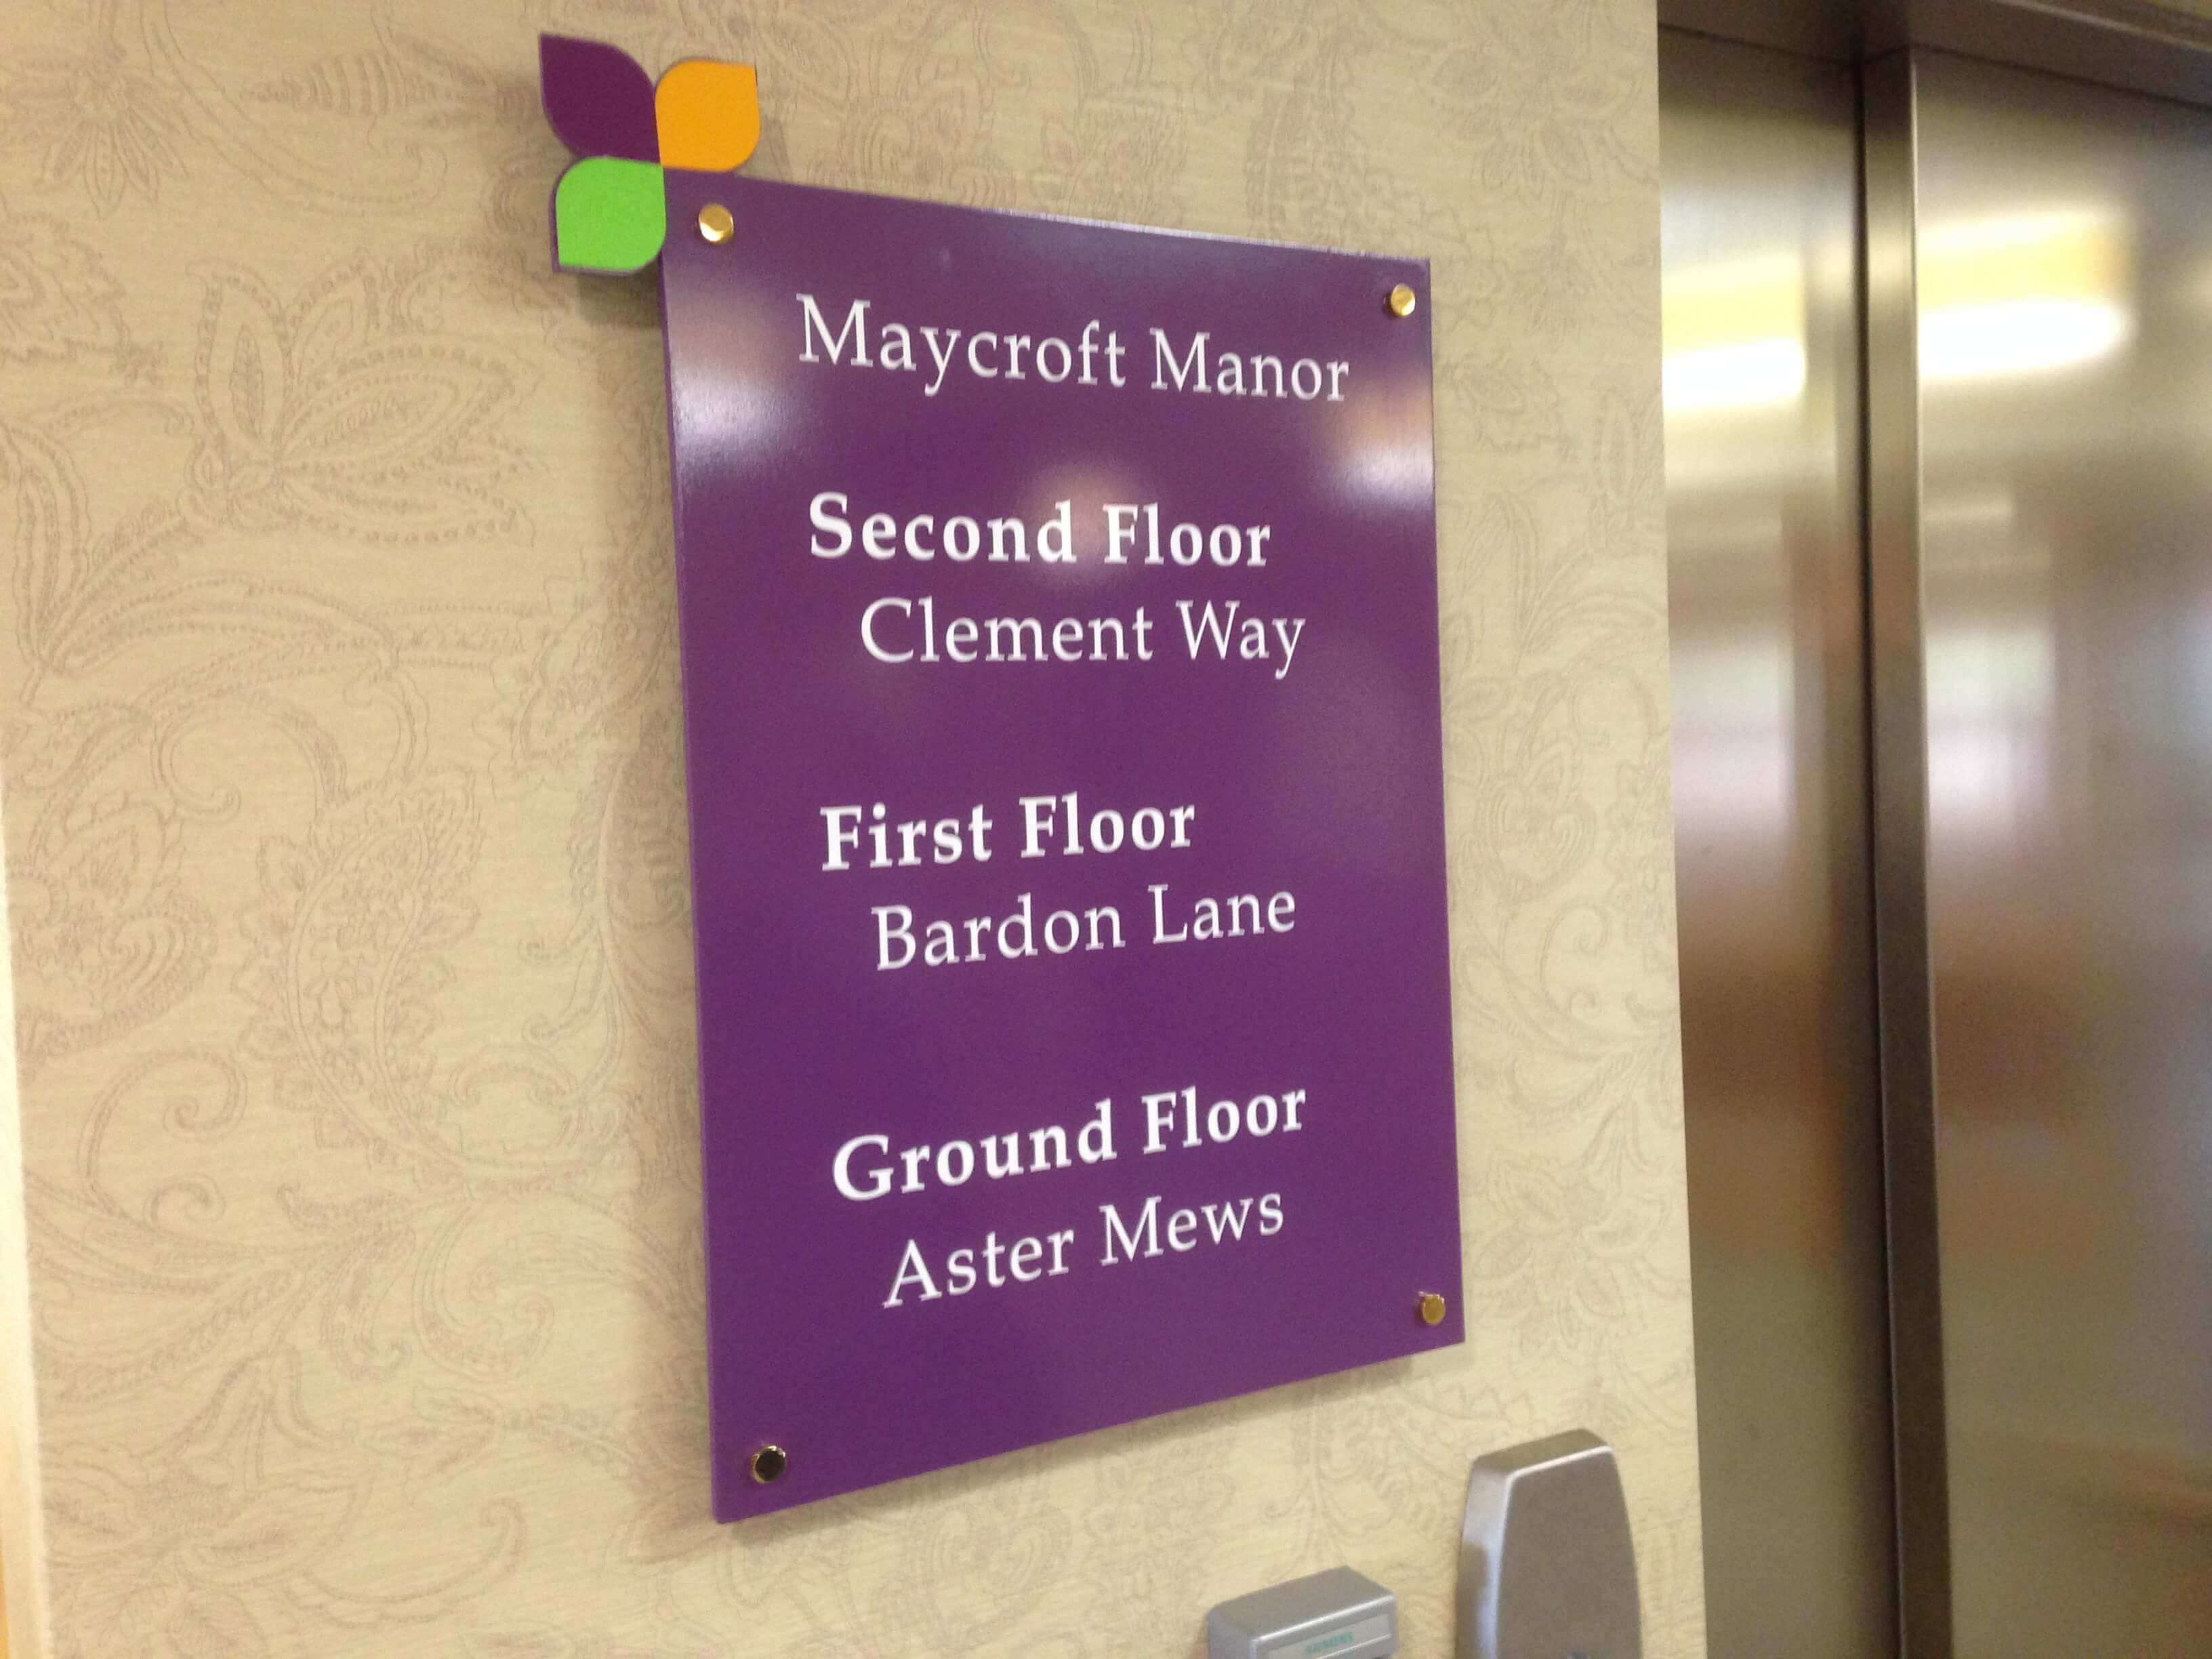 Maycroft Manor